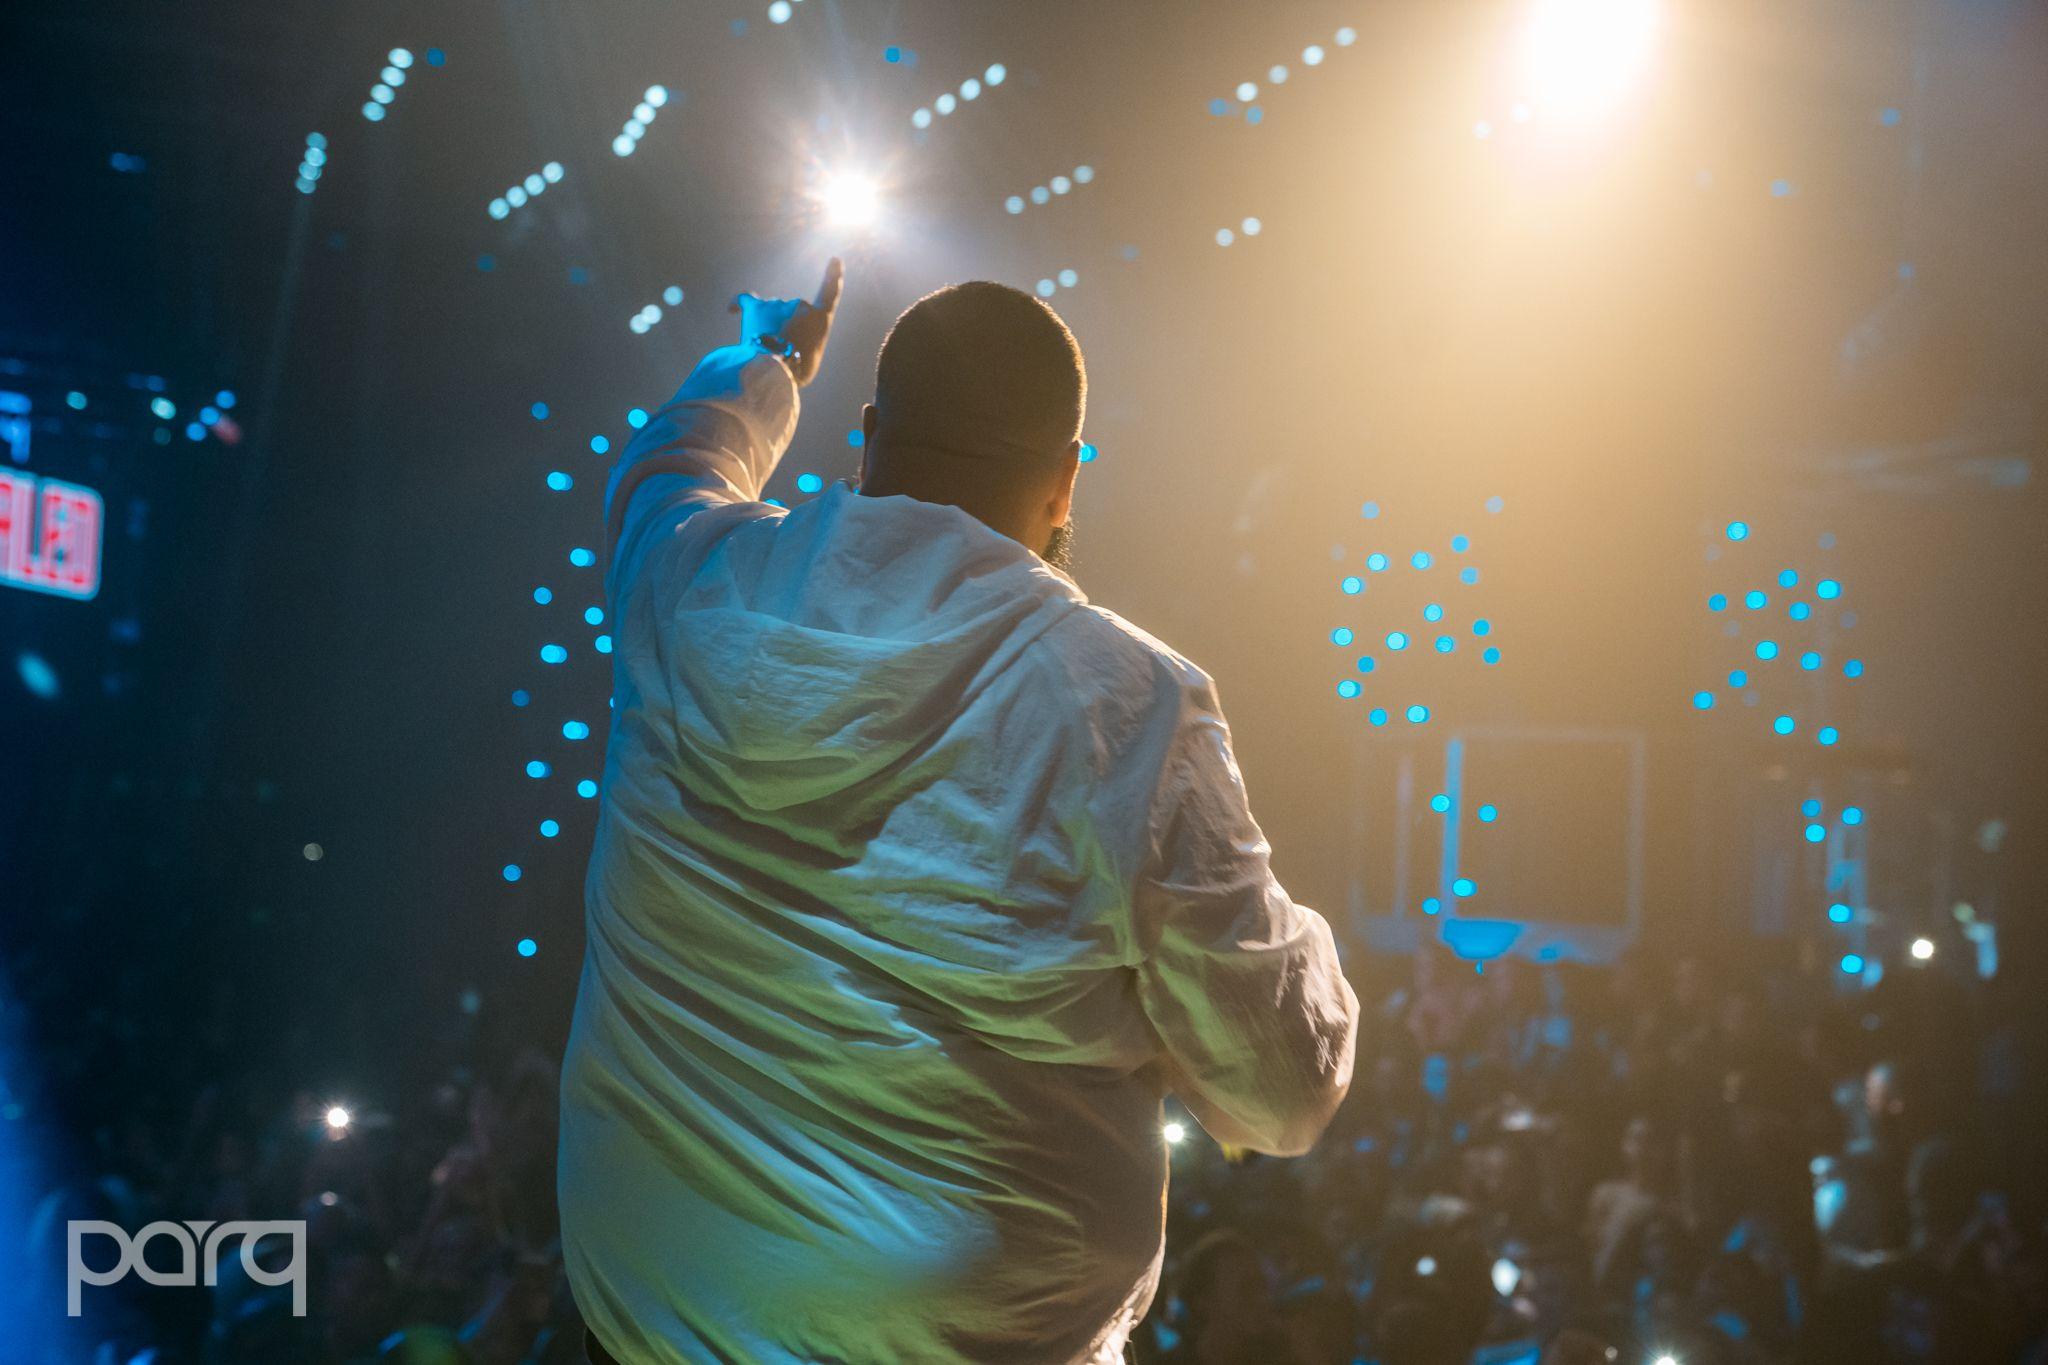 09.27.18 Parq - DJ Khaled-12.jpg